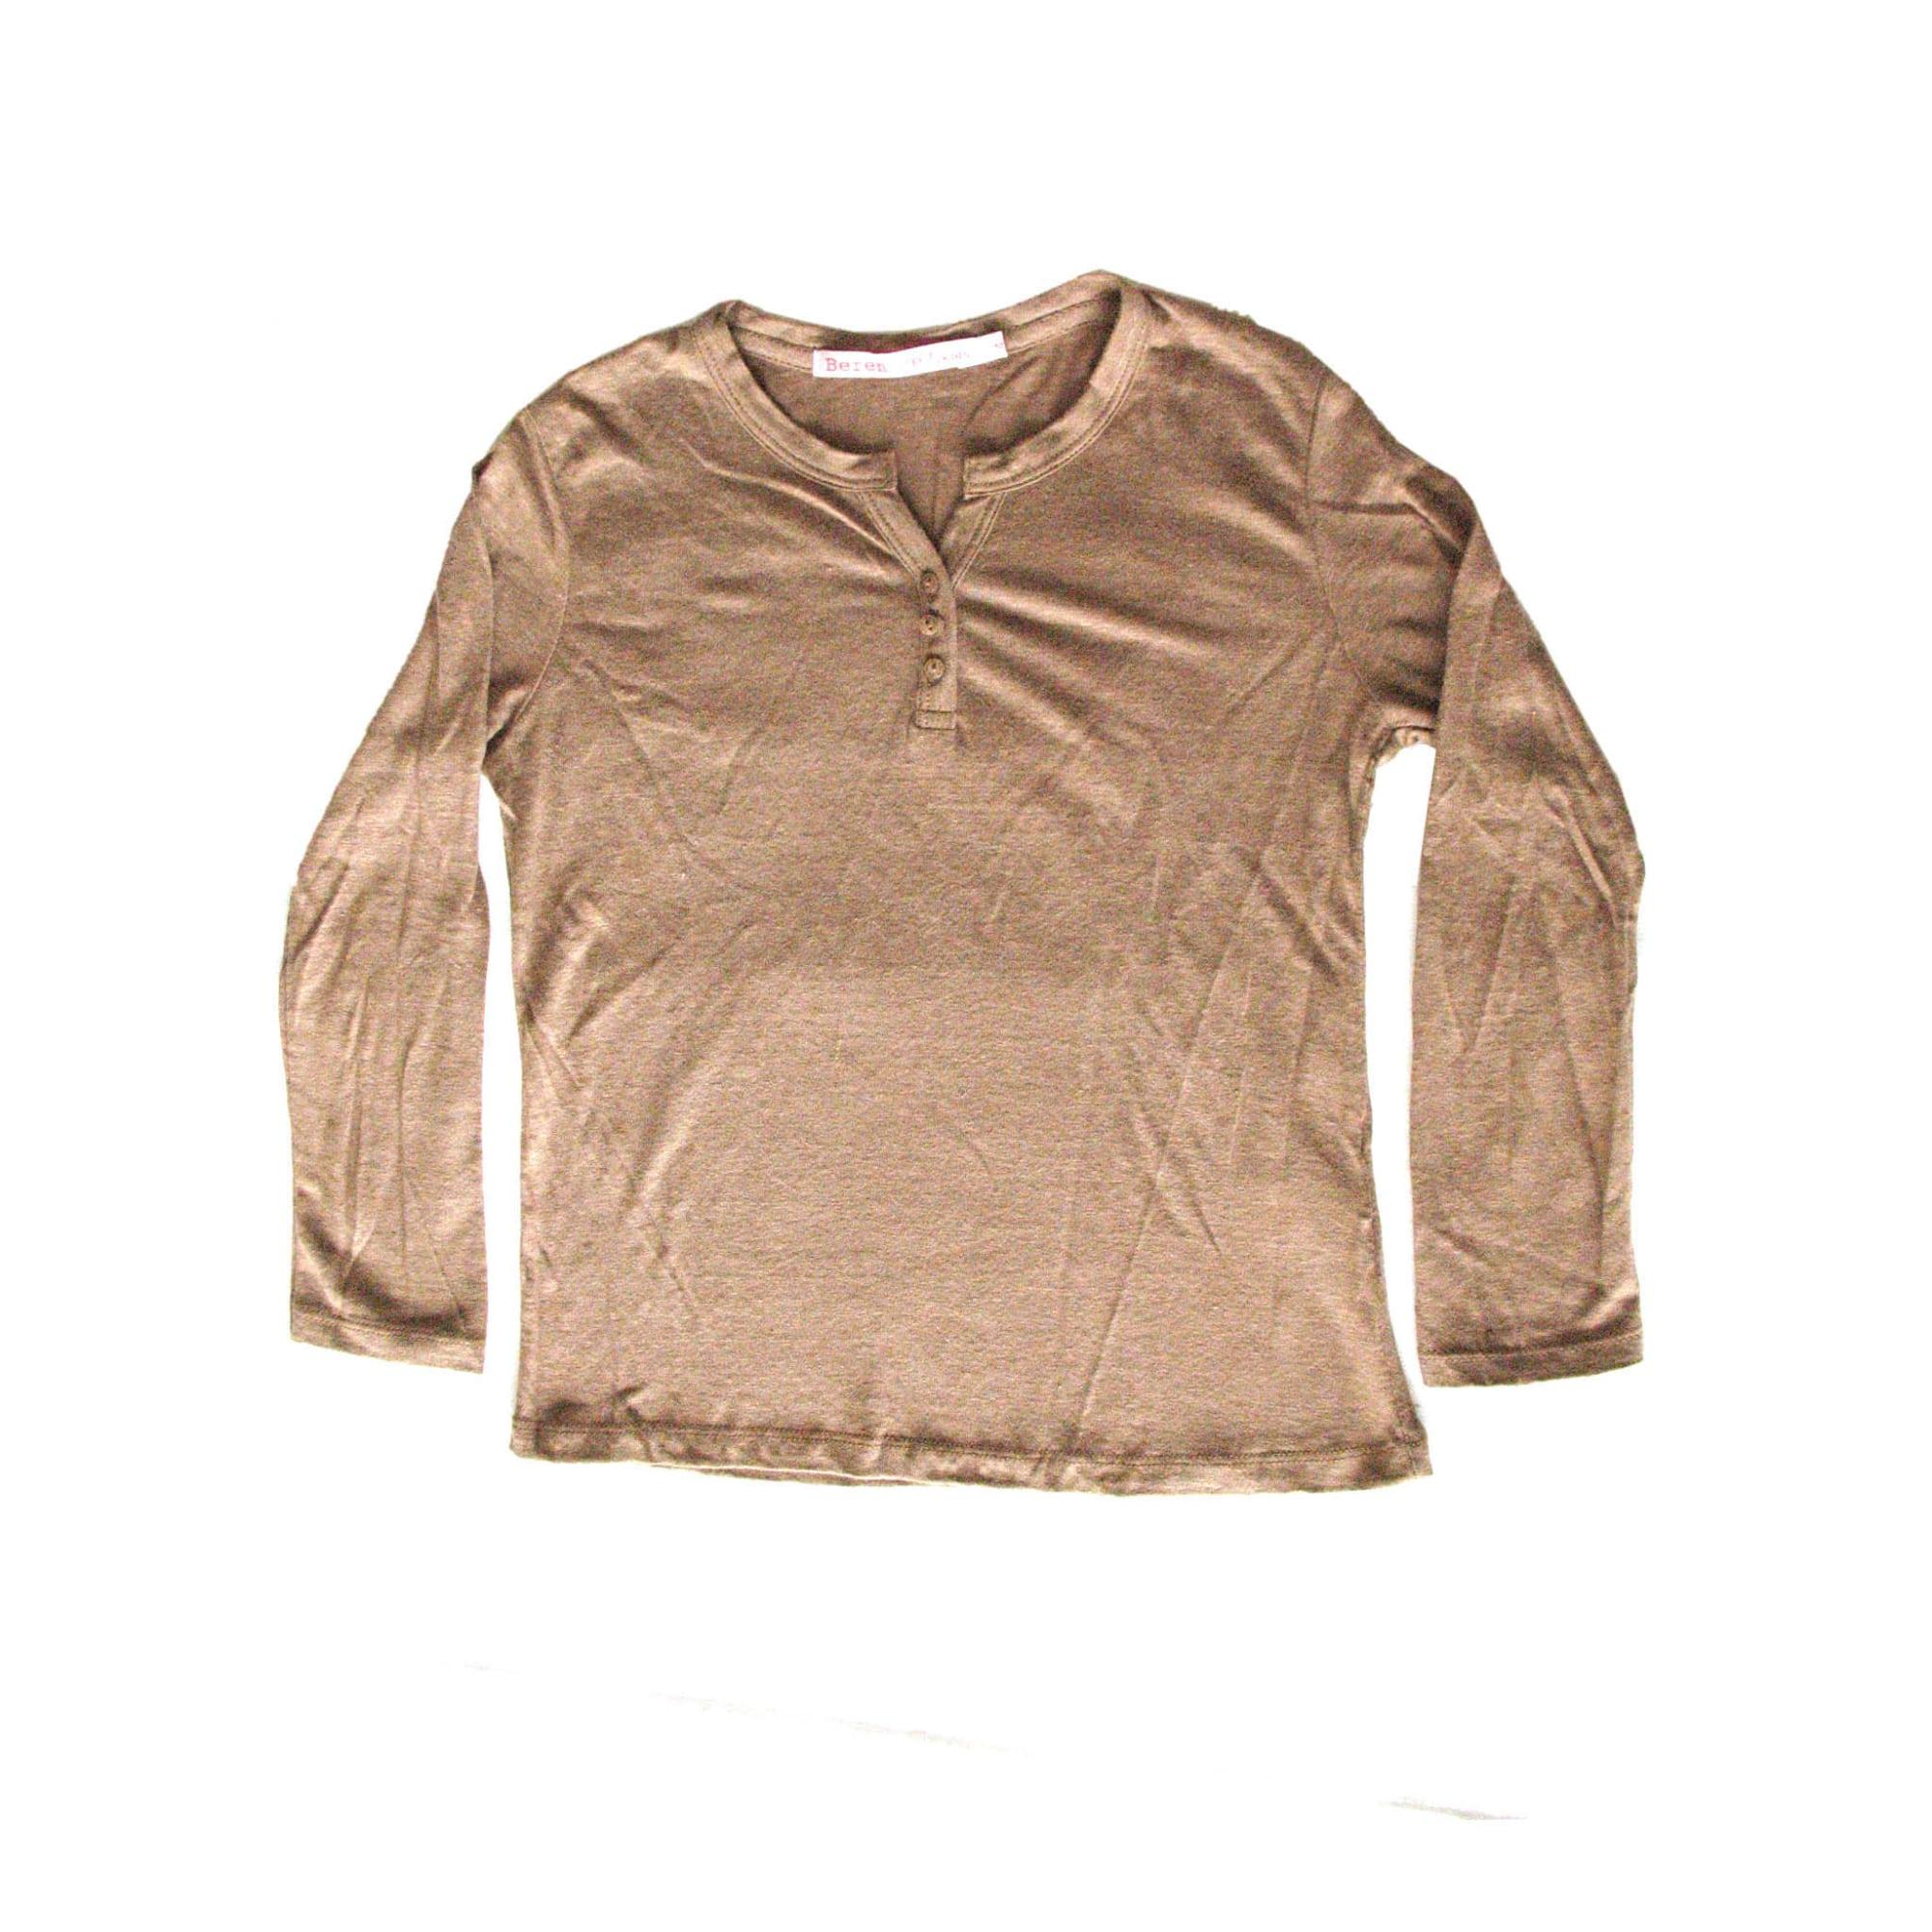 Top, Tee-shirt BERENICE Marron